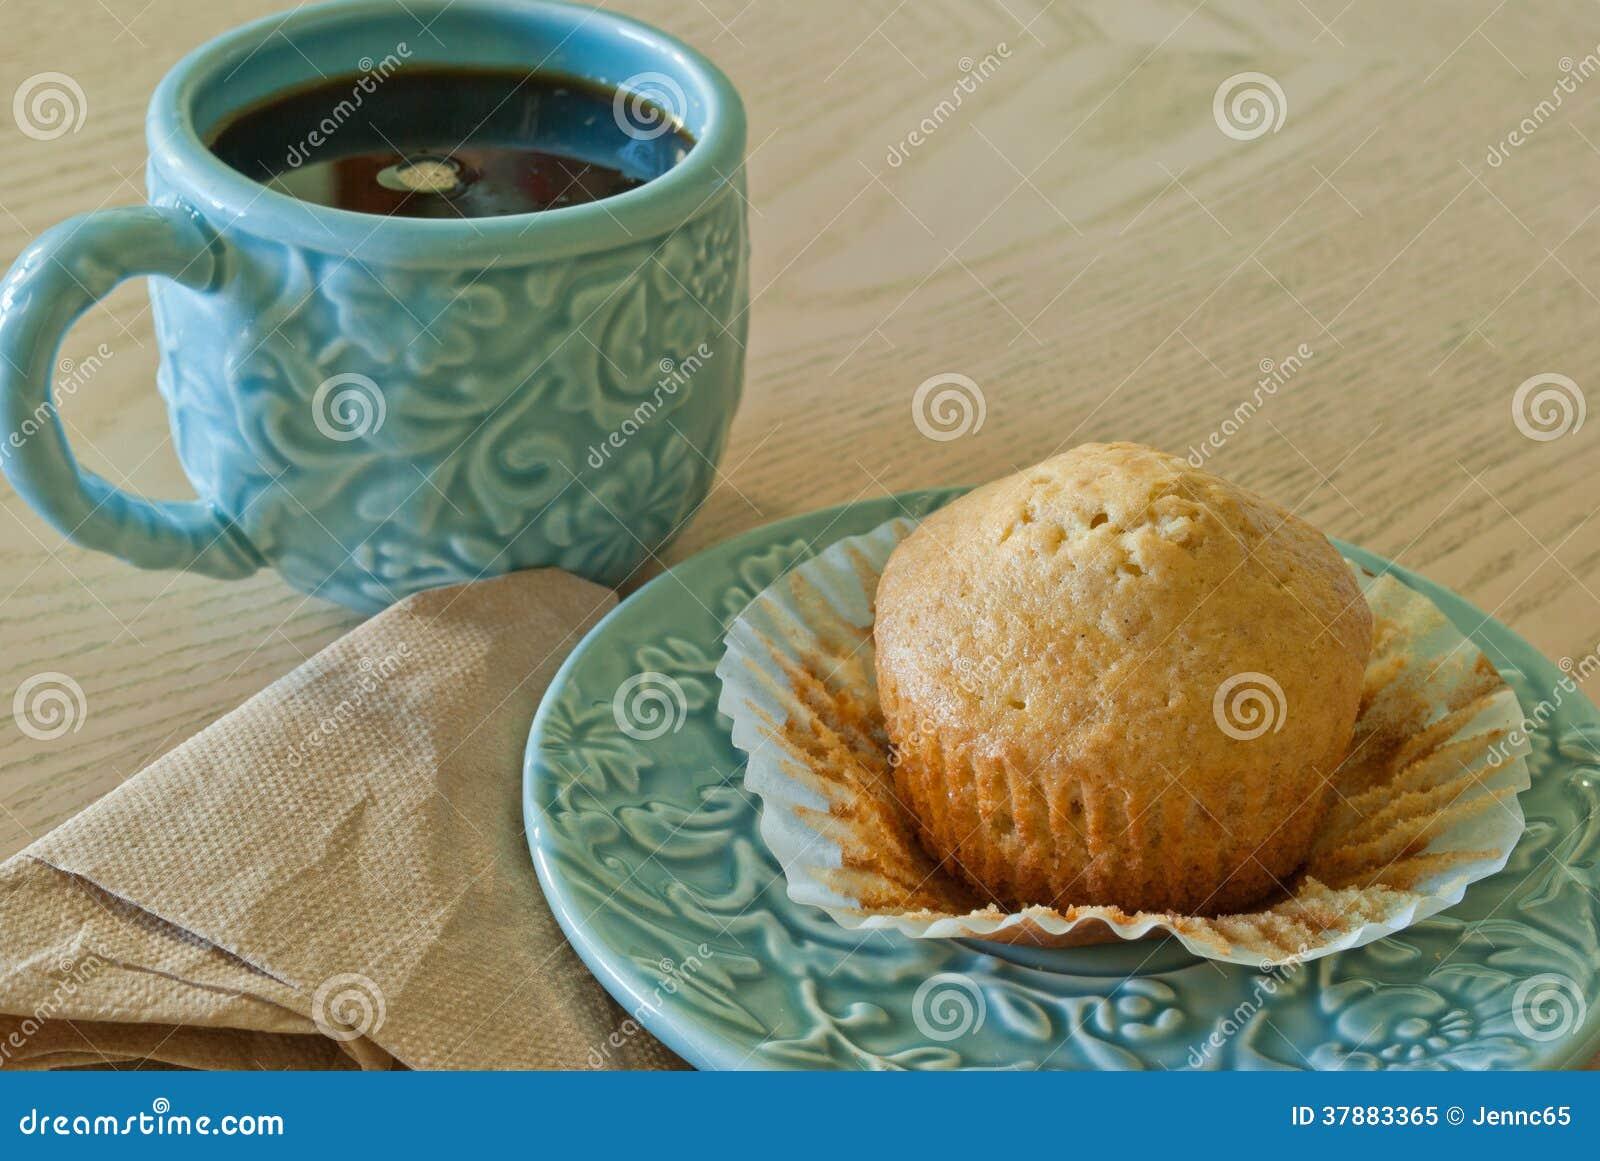 Koffie en eigengemaakte muffin